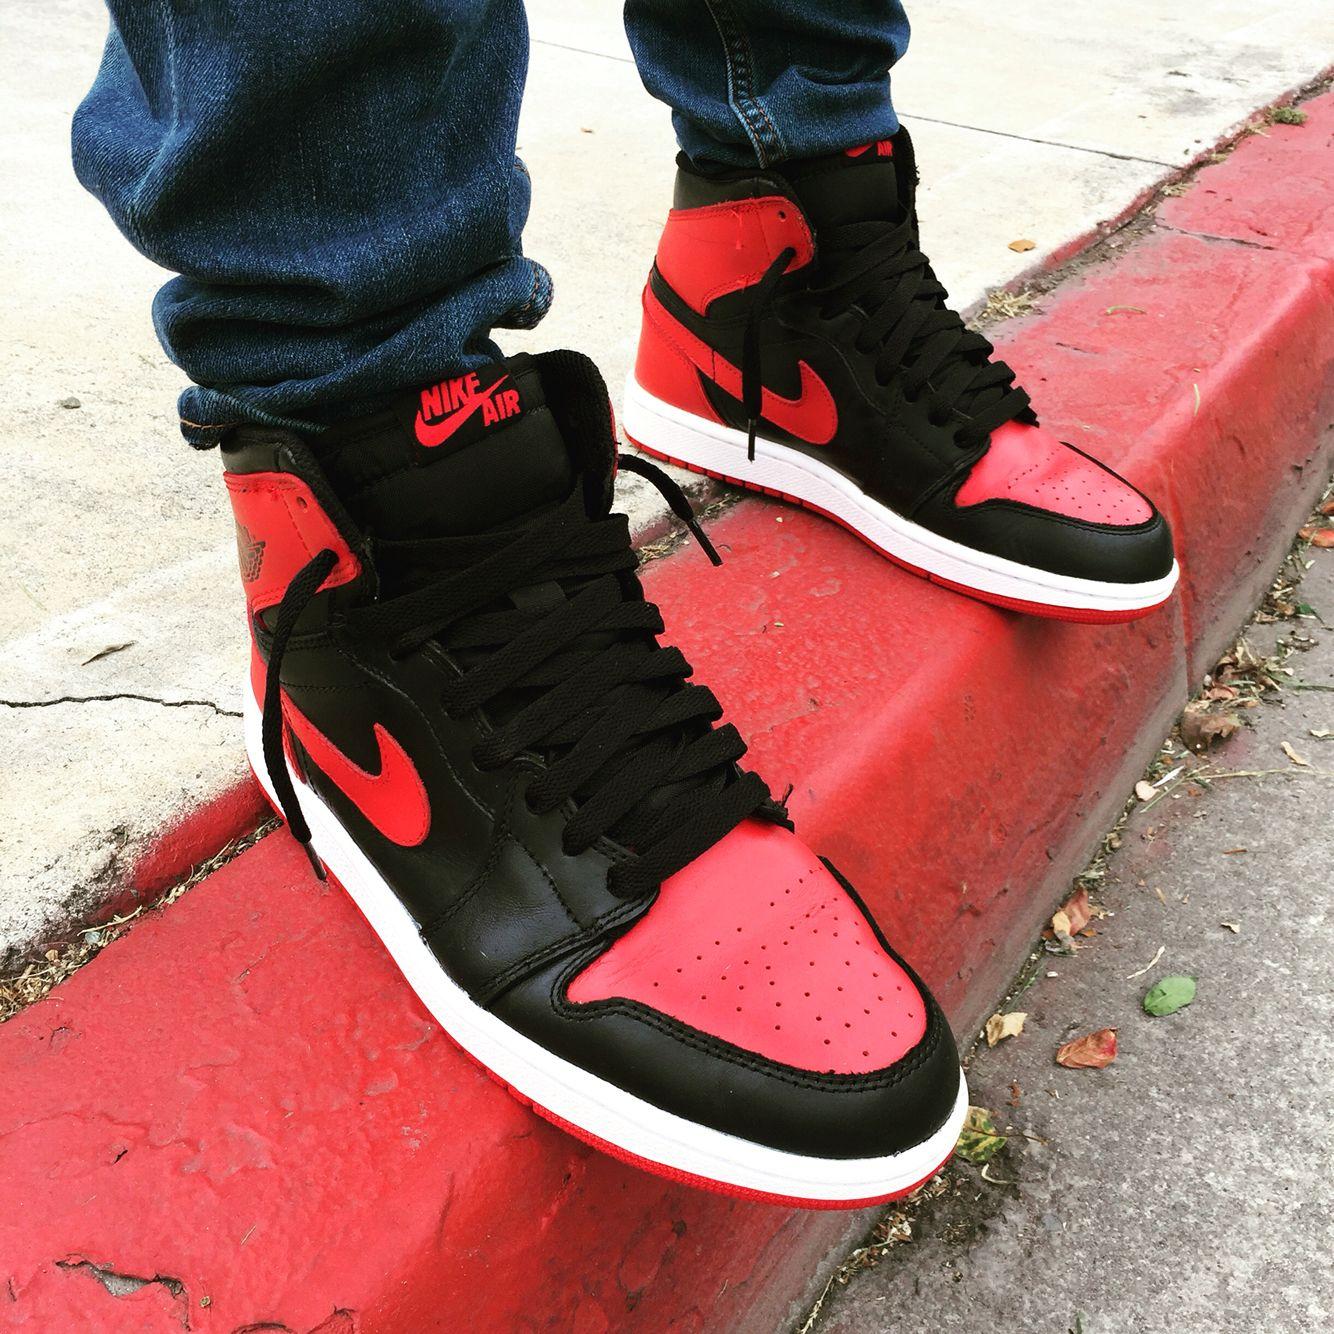 Bred Jordan 1's